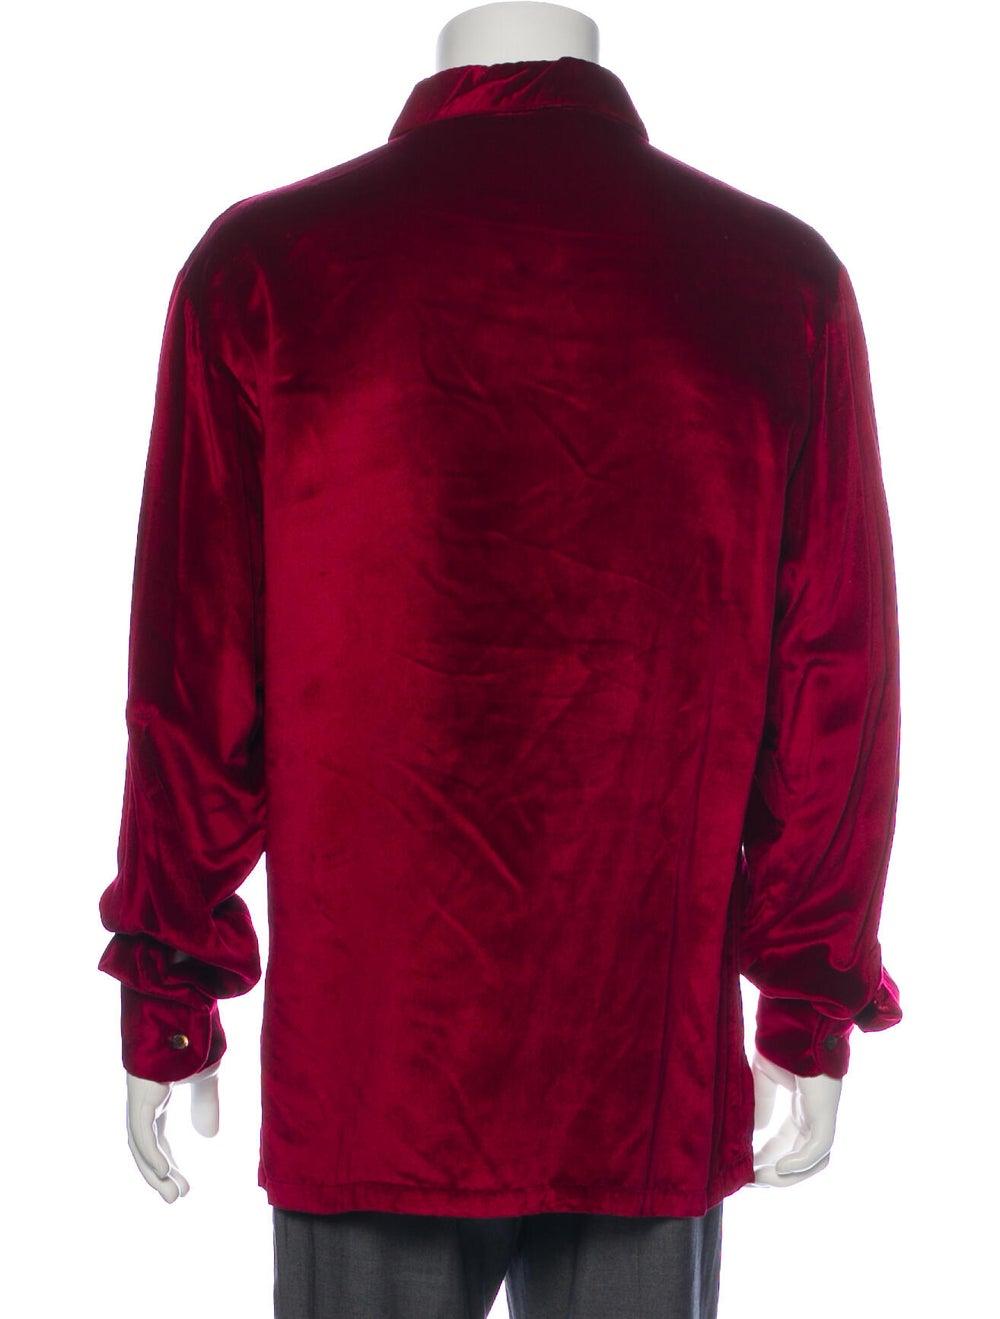 Gucci Vintage 1990's Dress Shirt Red - image 3